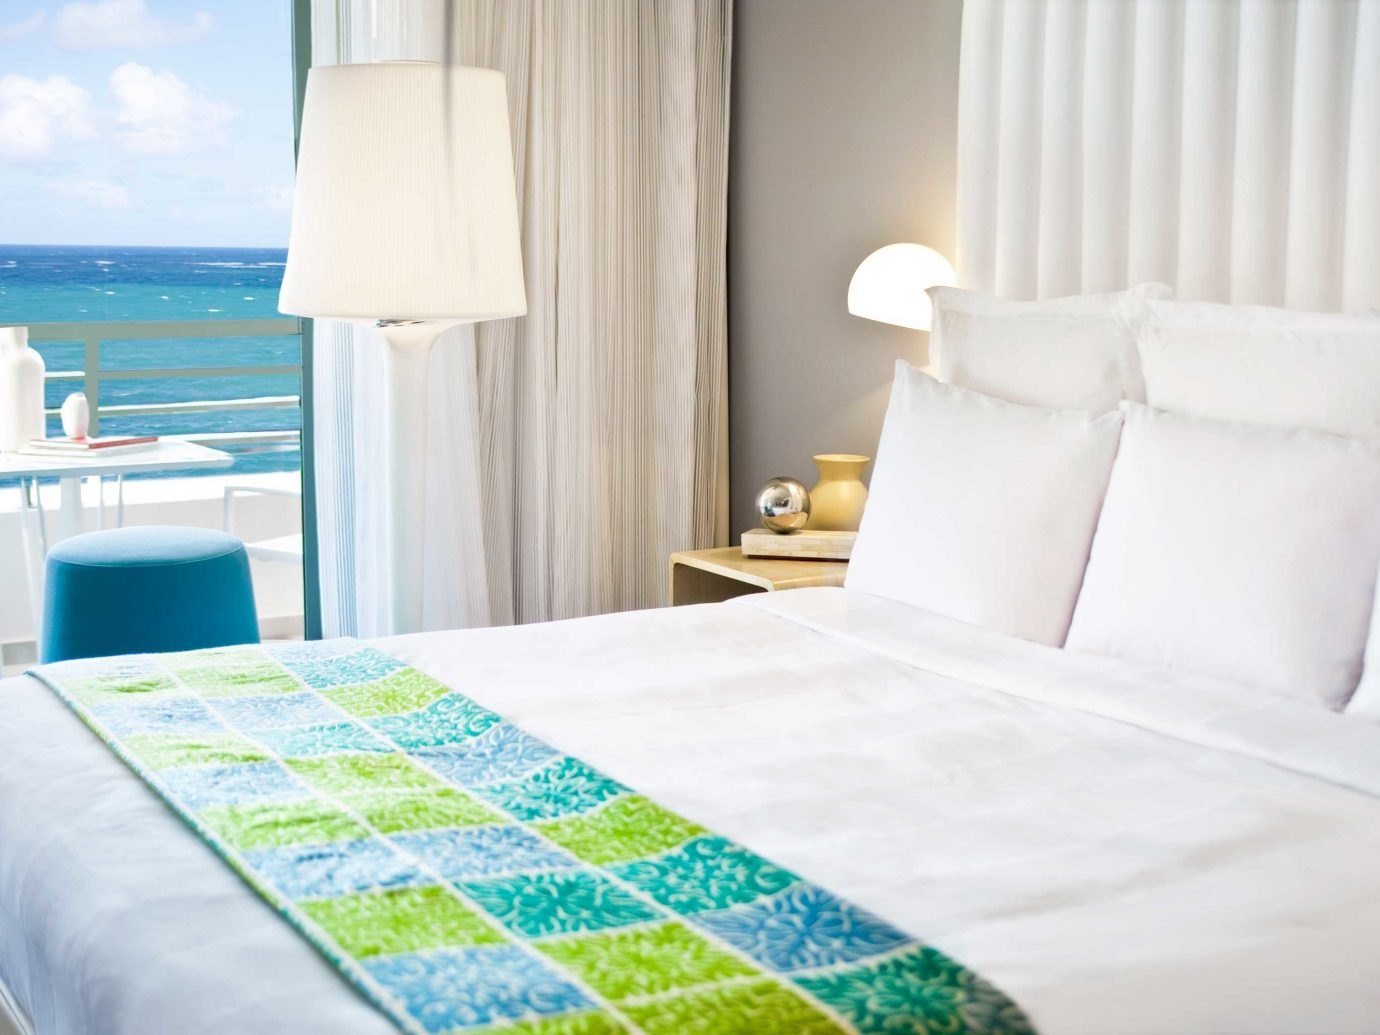 Beachfront Bedroom Hotels Modern Resort indoor bed room Suite bed sheet white cottage interior design hotel furniture textile apartment bedclothes